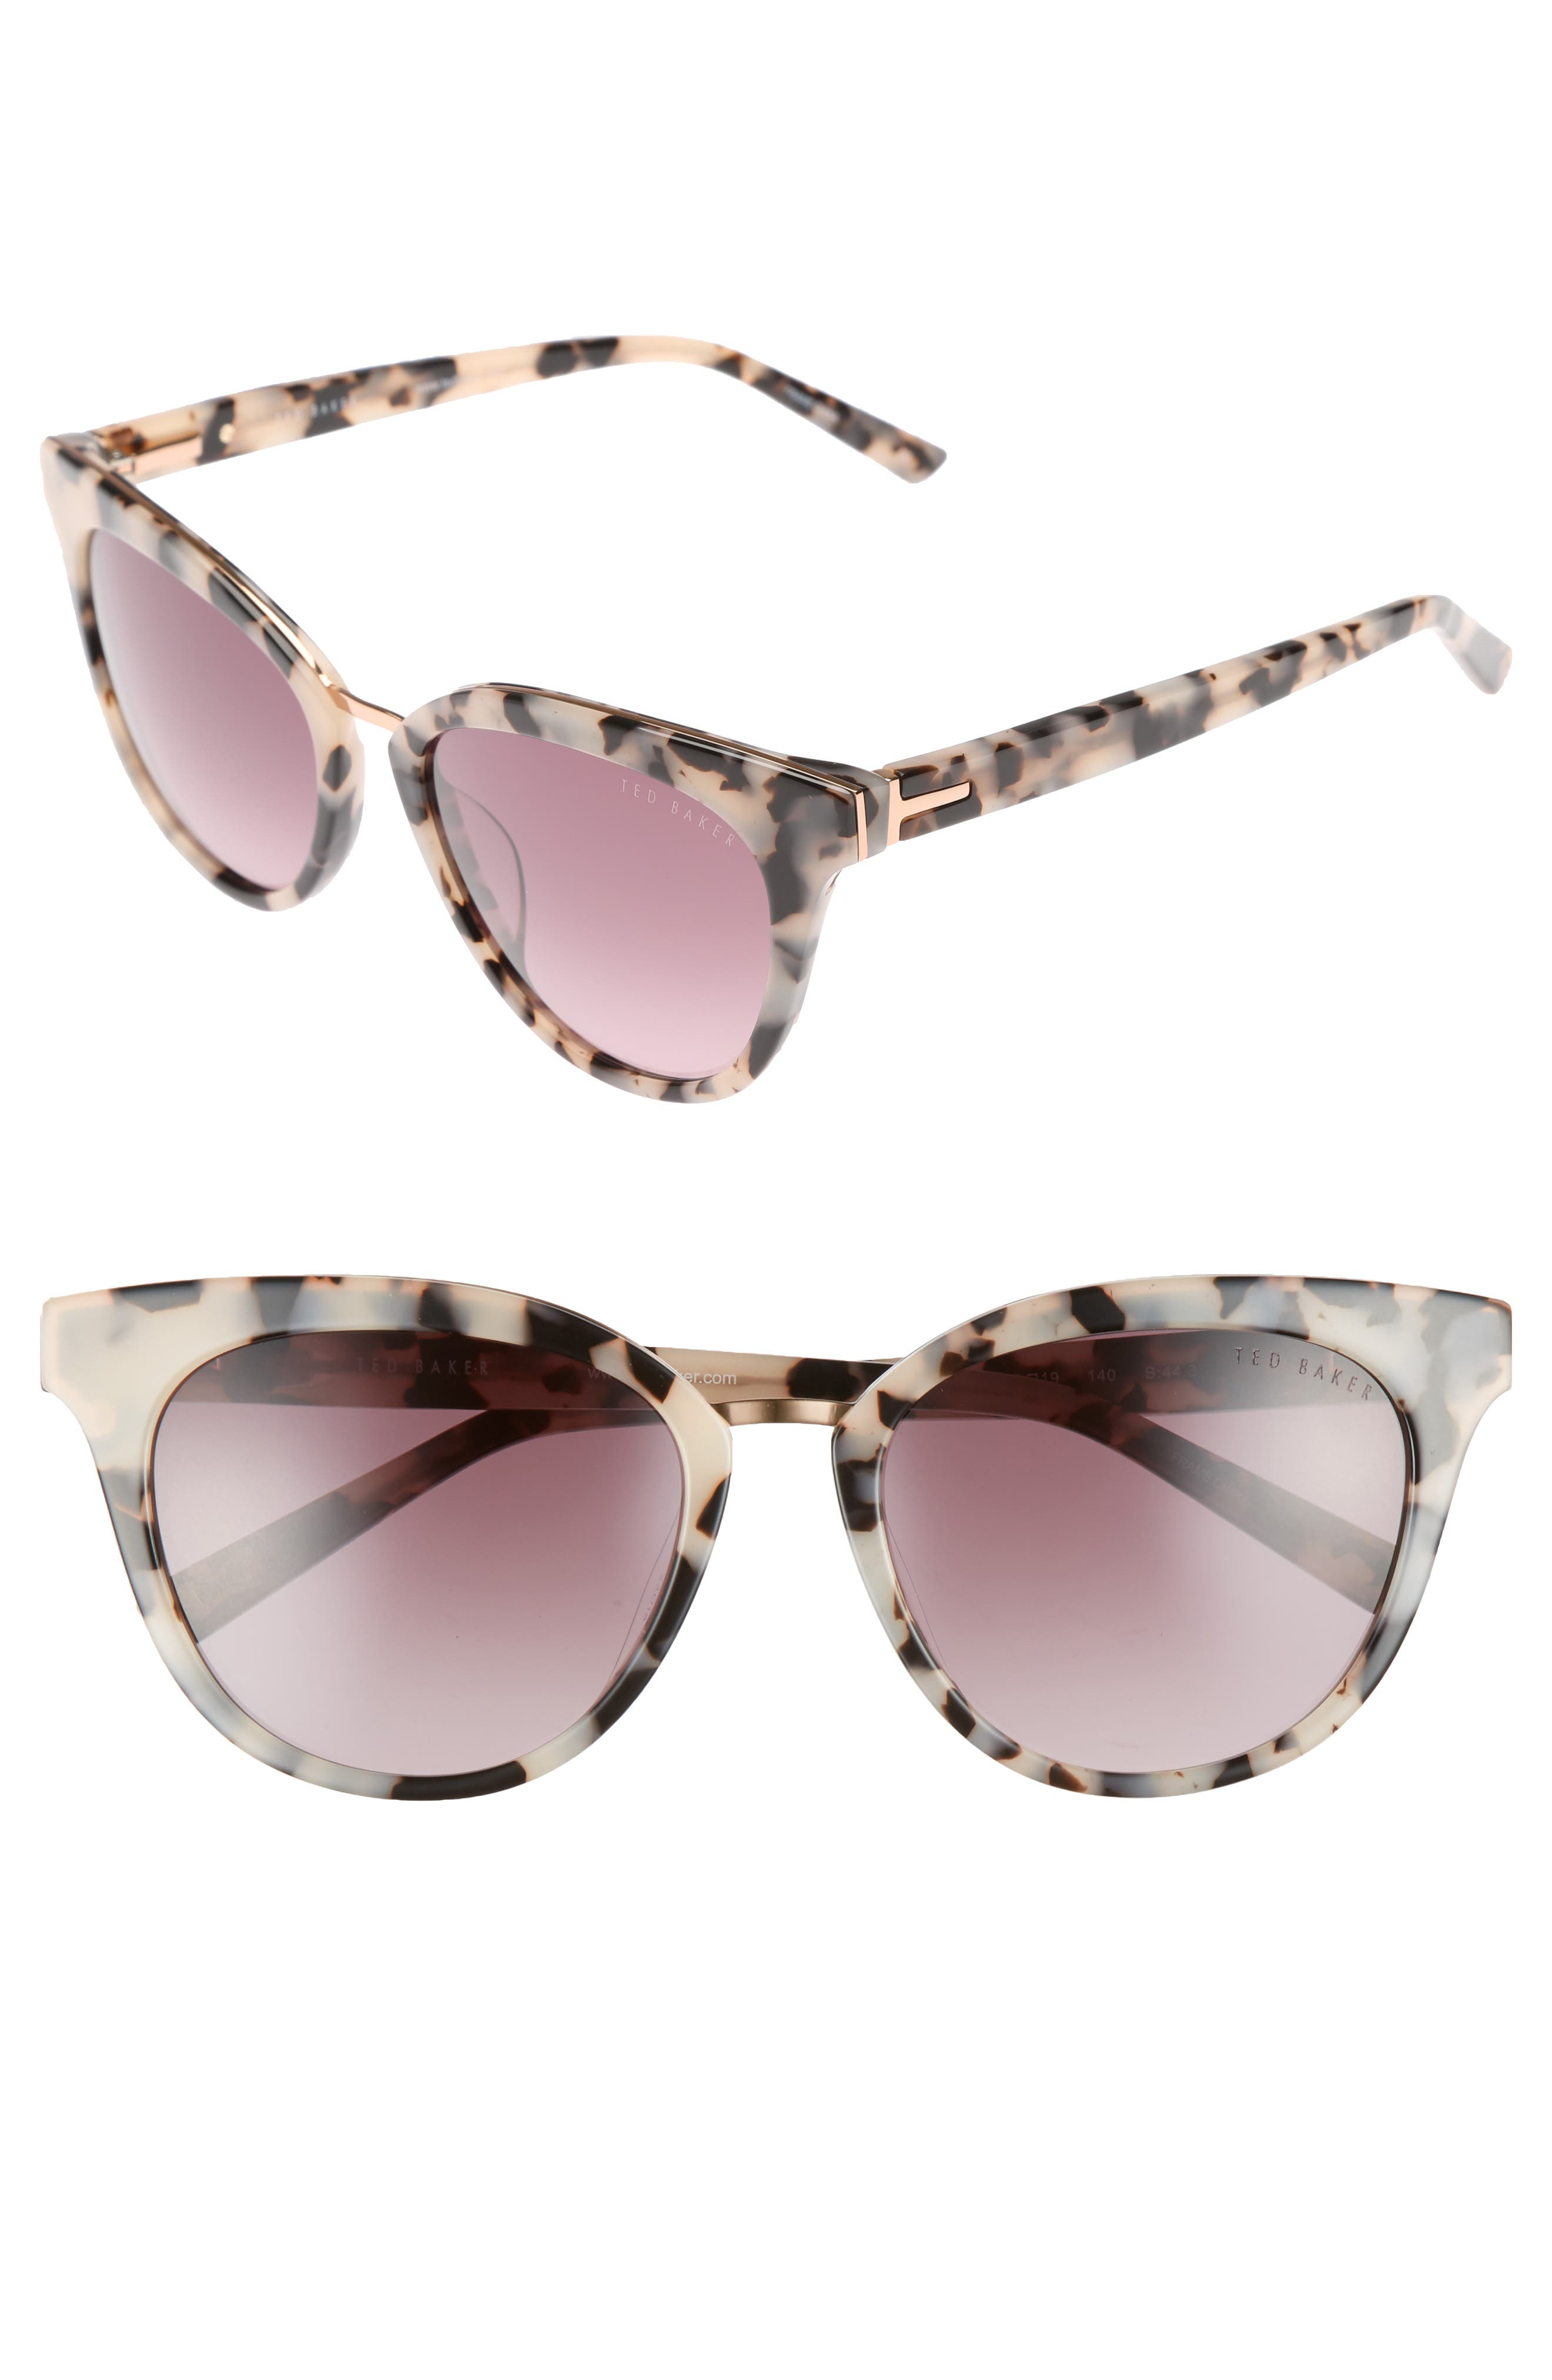 53mm Cat Eye Sunglasses,                             Main thumbnail 1, color,                             IVORY